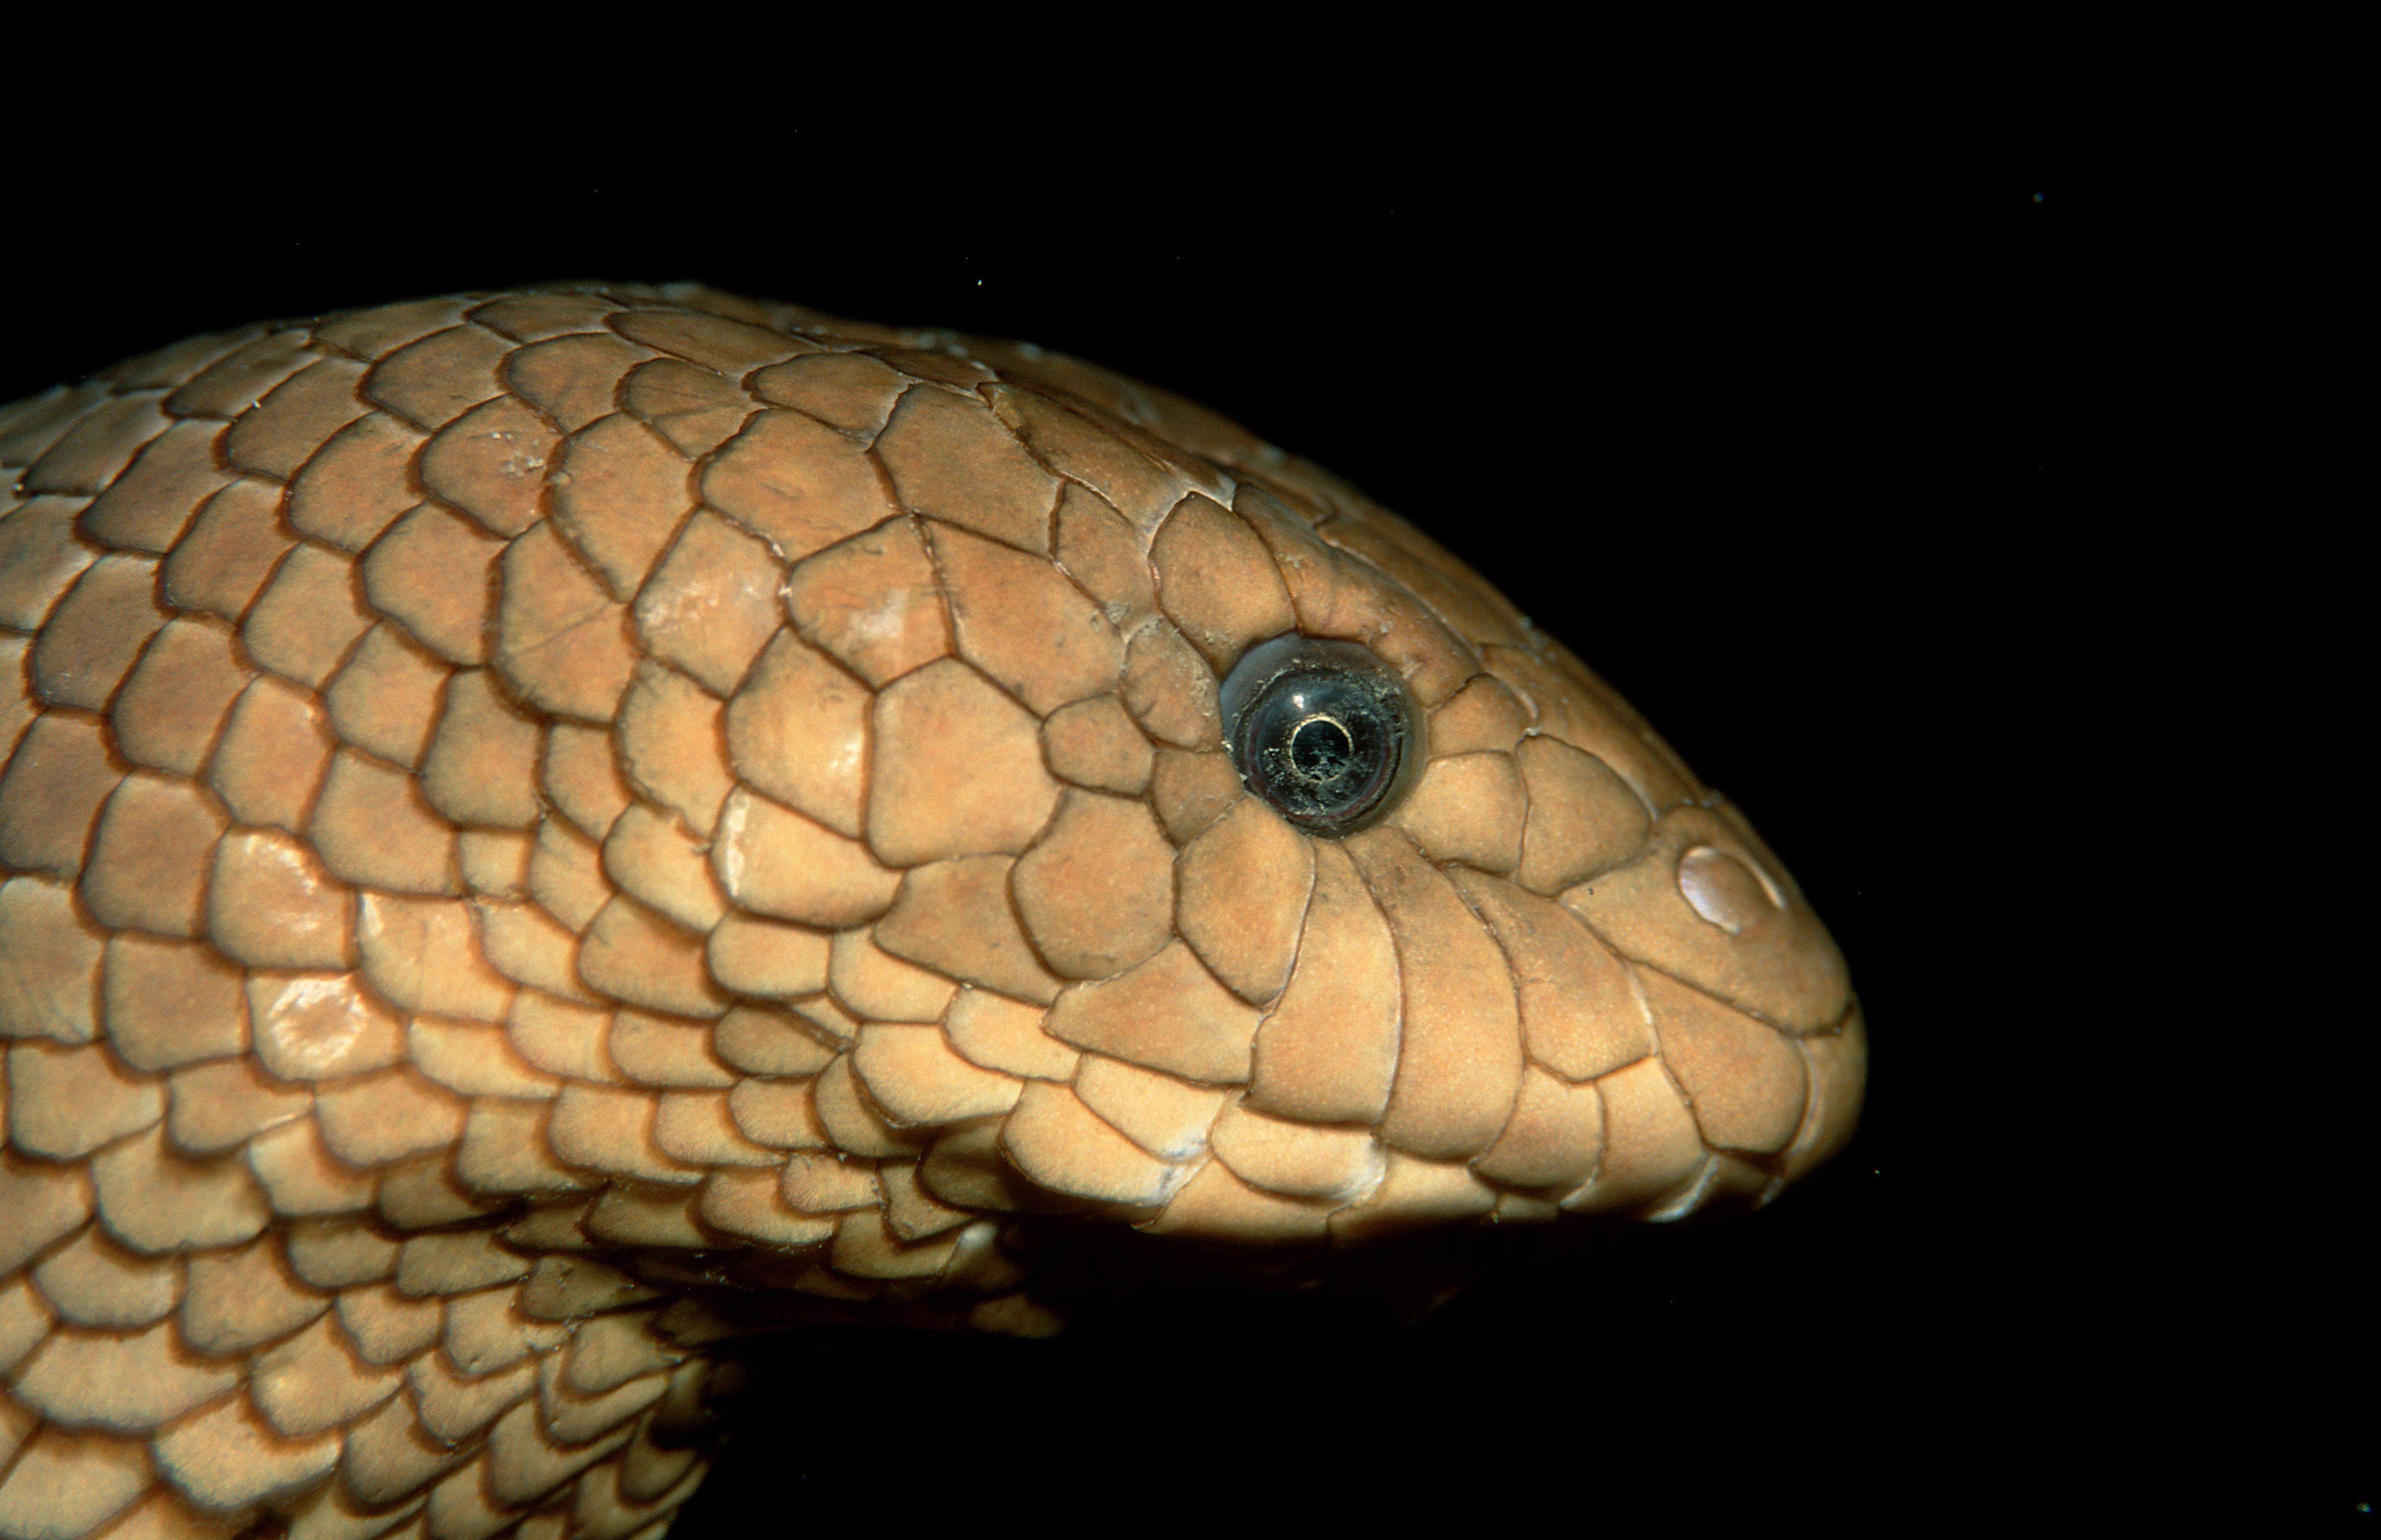 Olive sea snake, Hydrophiidae, Pacific ocean, Papua New Guinea